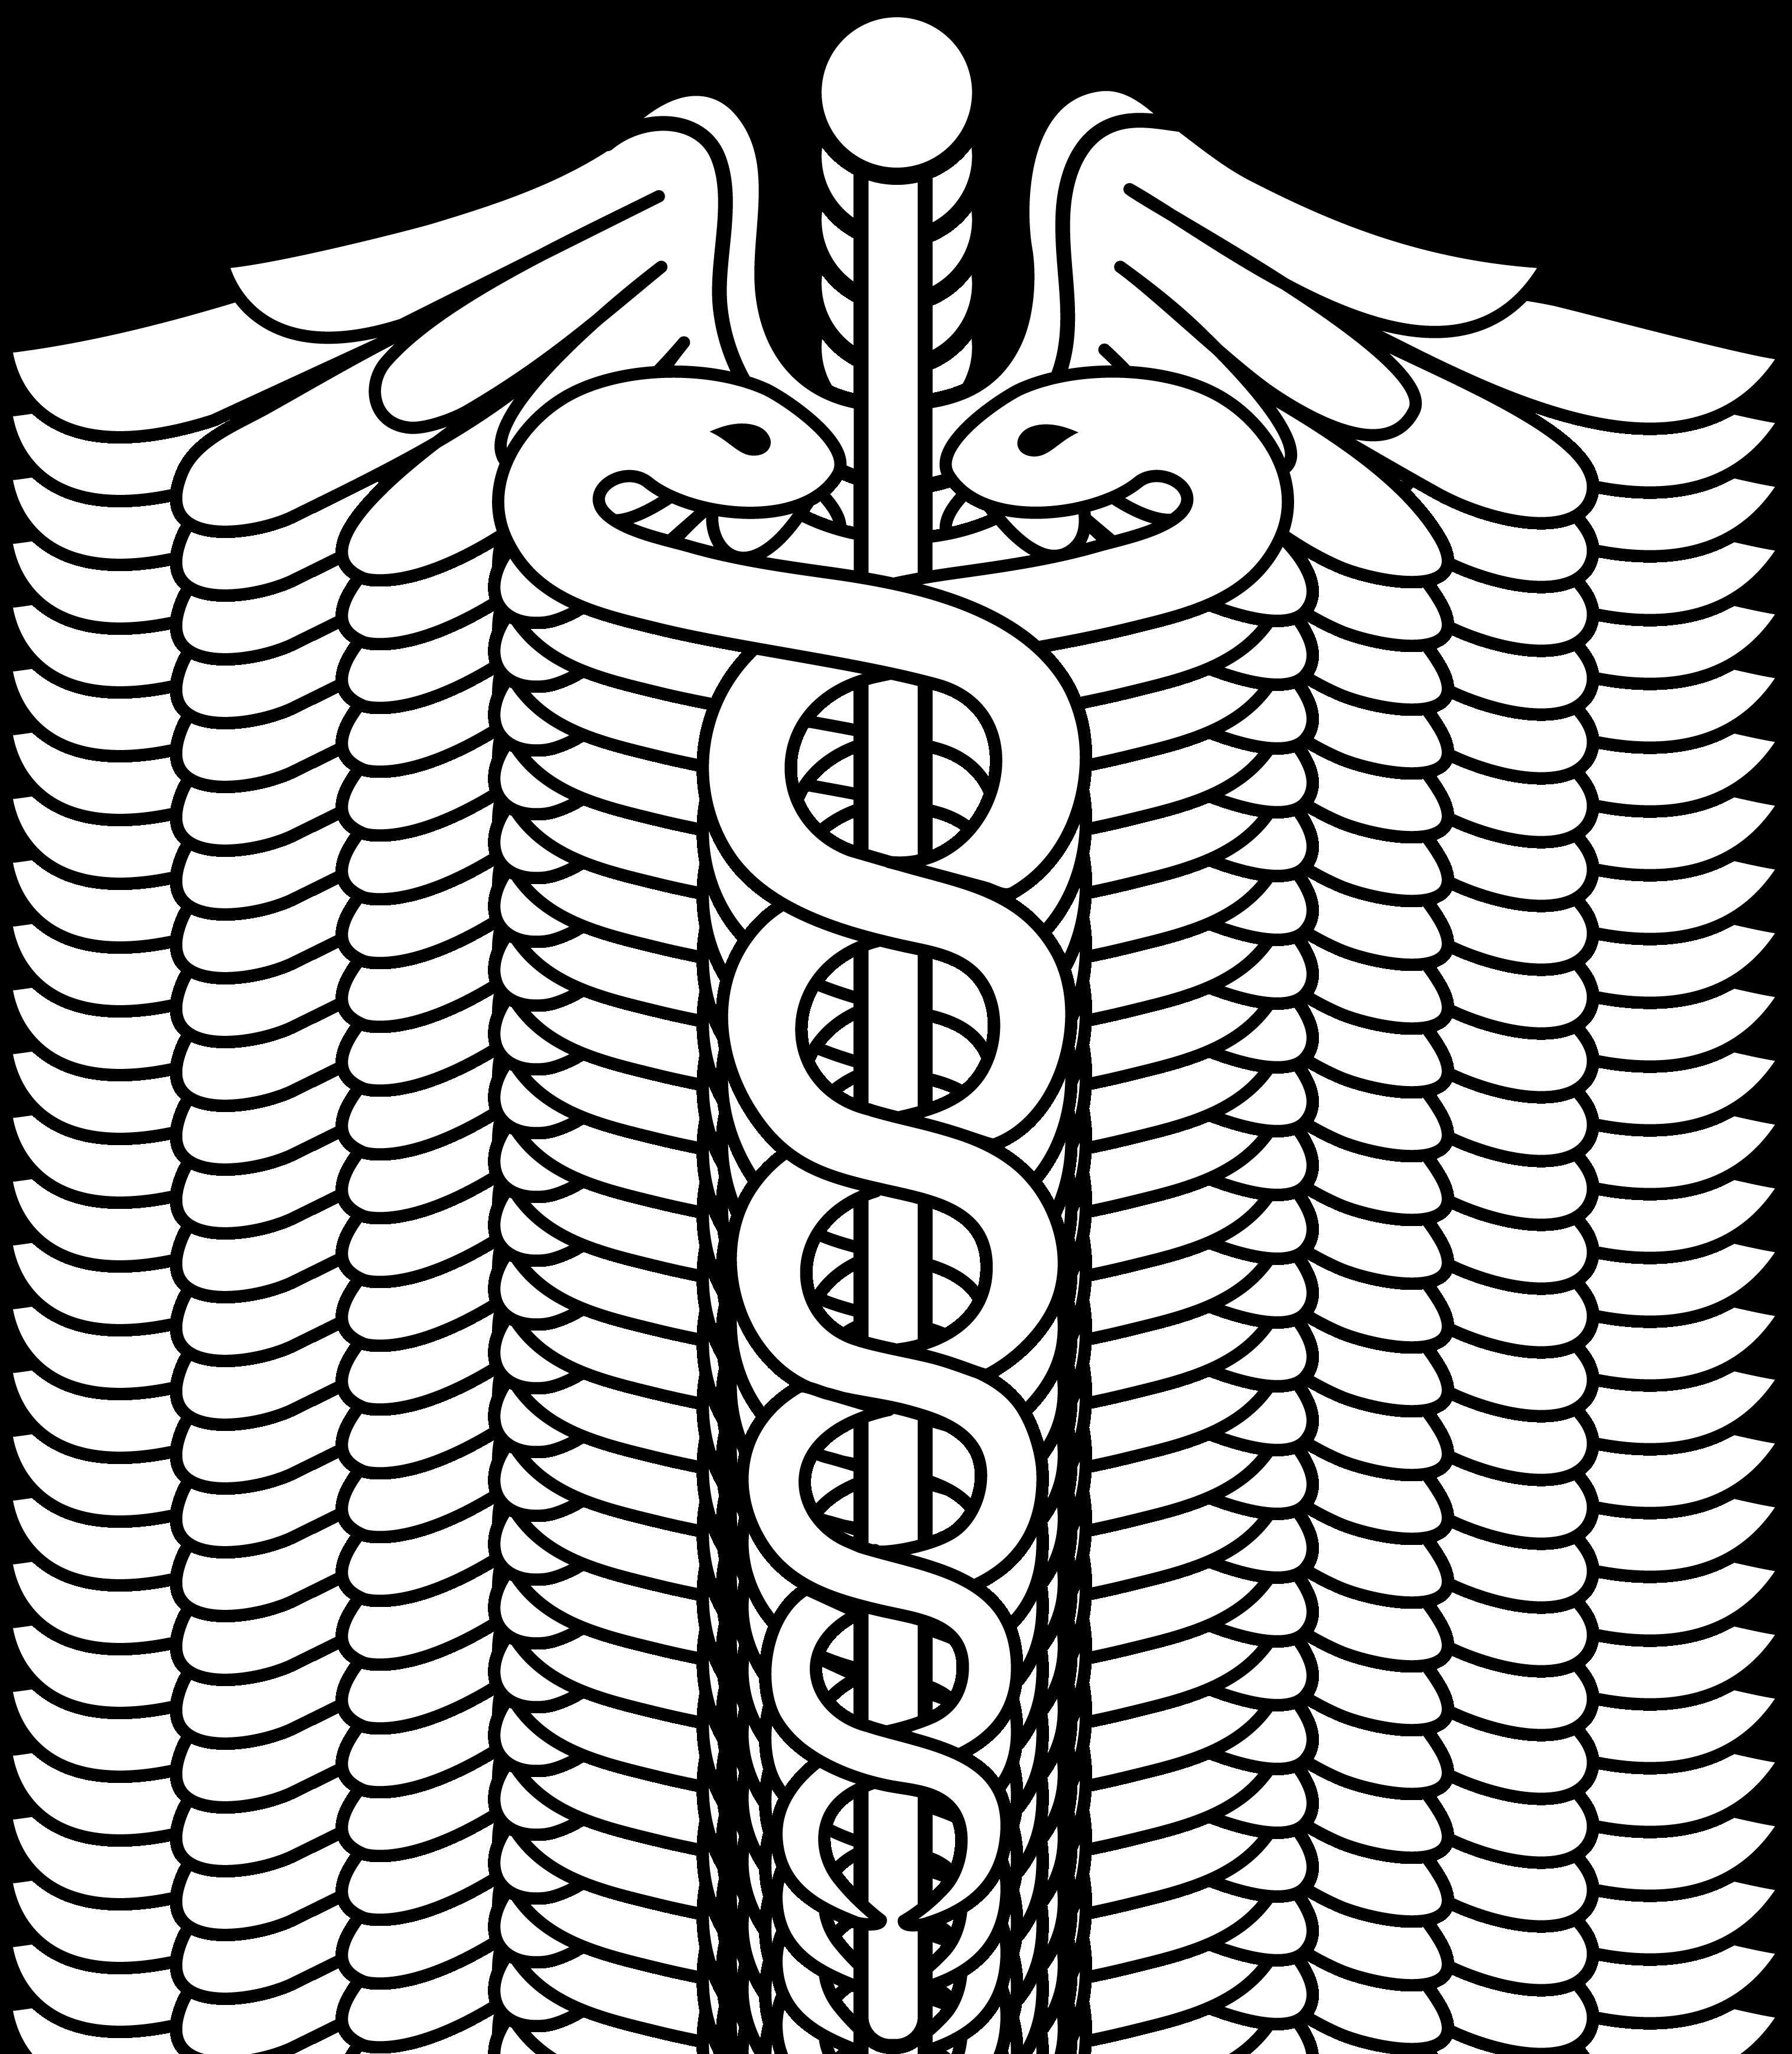 Beveled cross clipart banner library download Caduceus Medical Logo Lineart | patterns | Pinterest | Medical logo ... banner library download